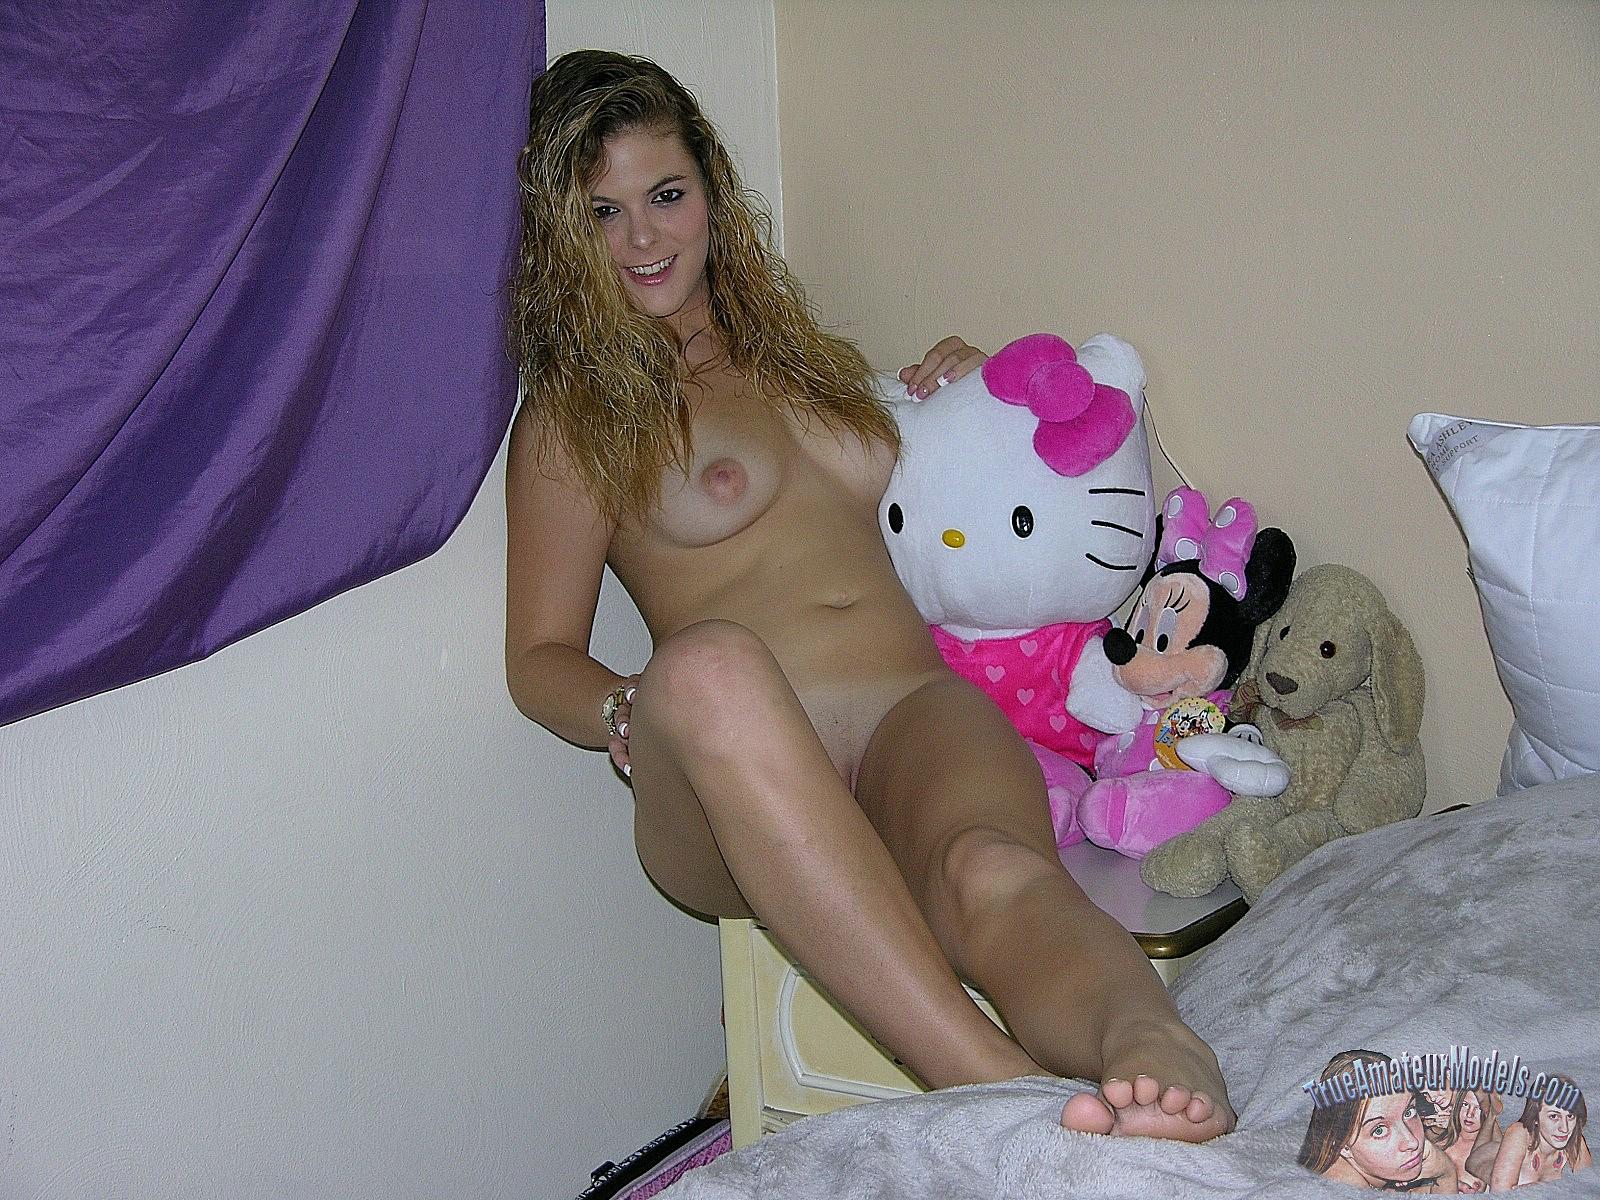 amateur nude girl bedroom